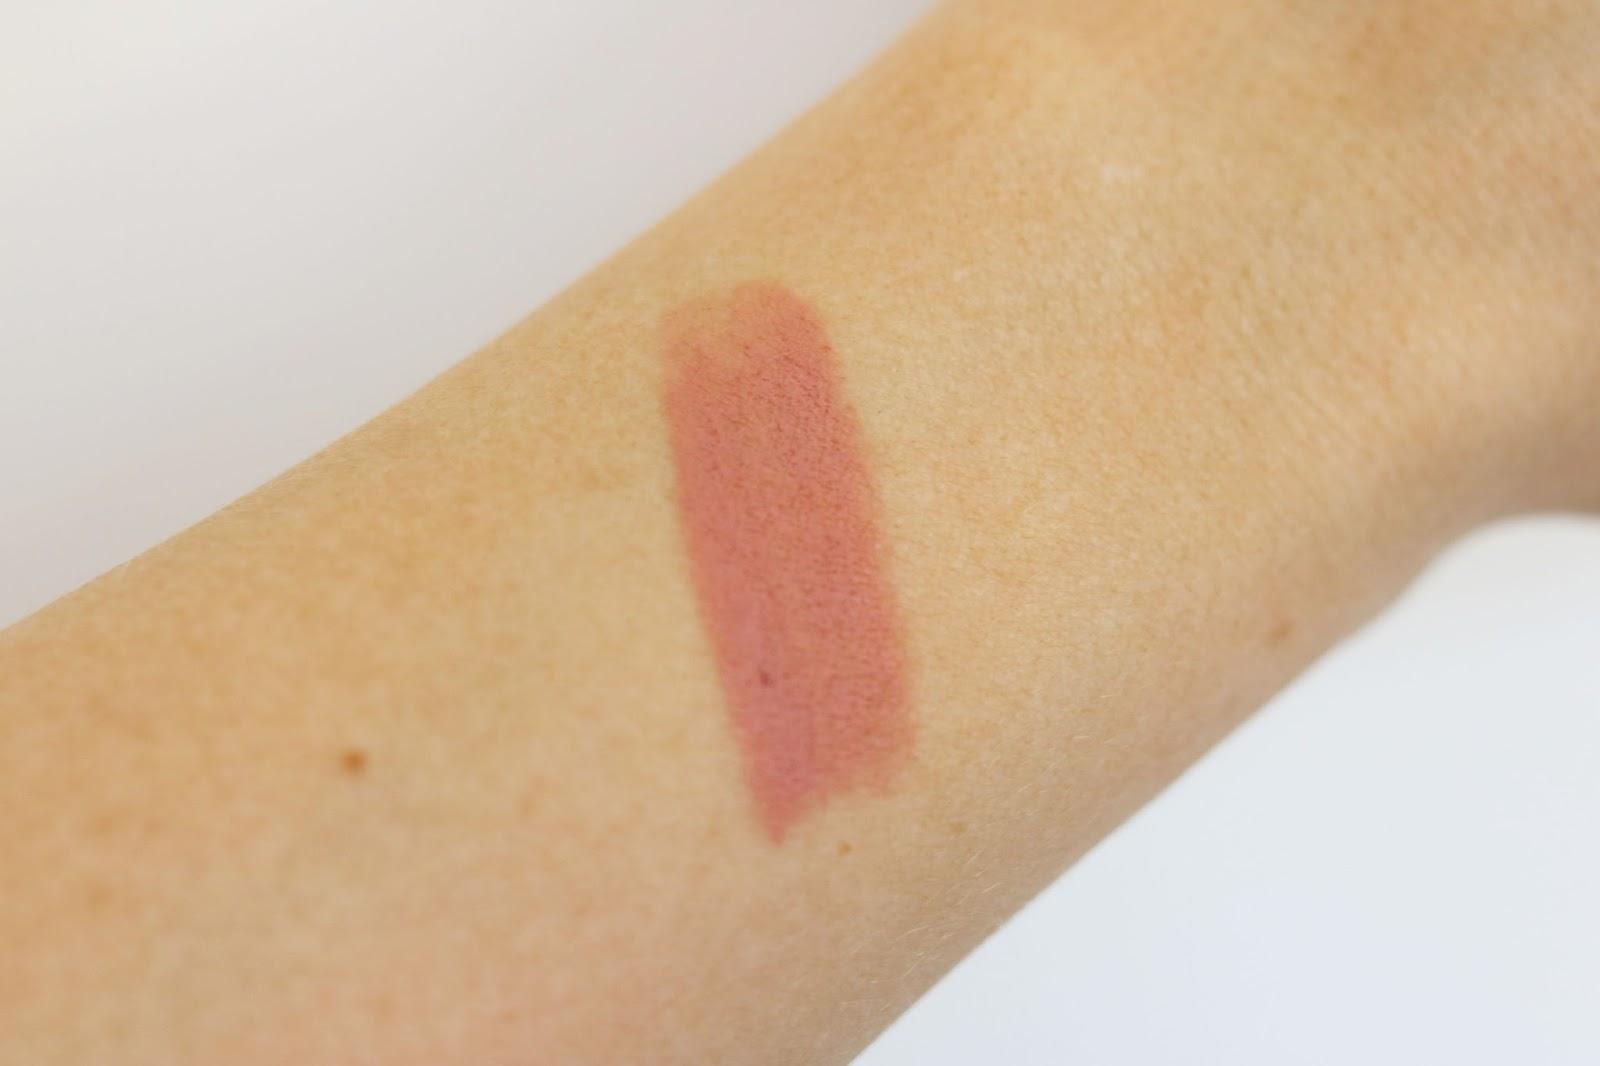 NYX lipstick swatch